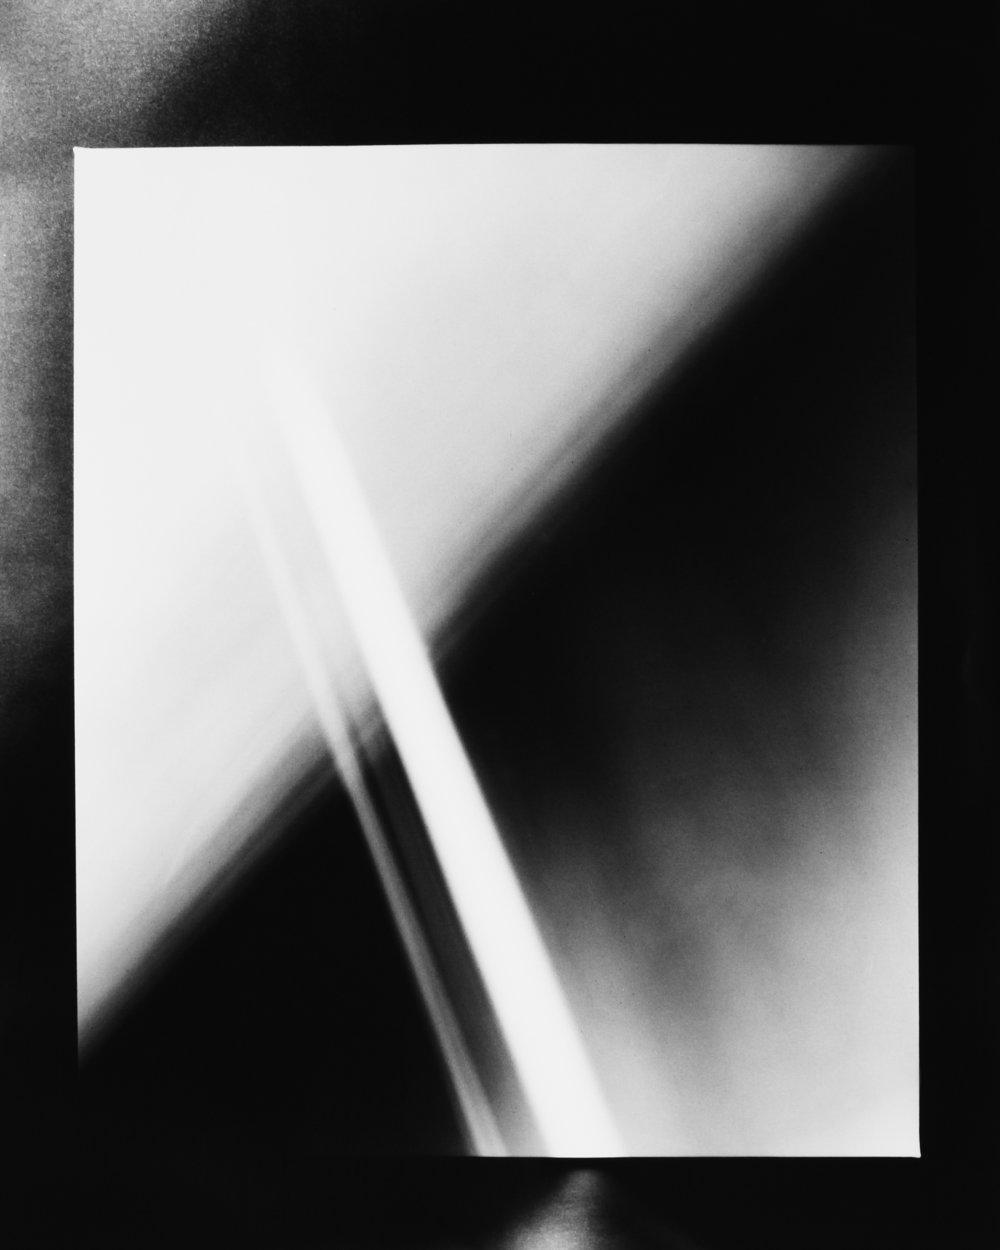 16 x 20 Inches  Silver Gelatin Print